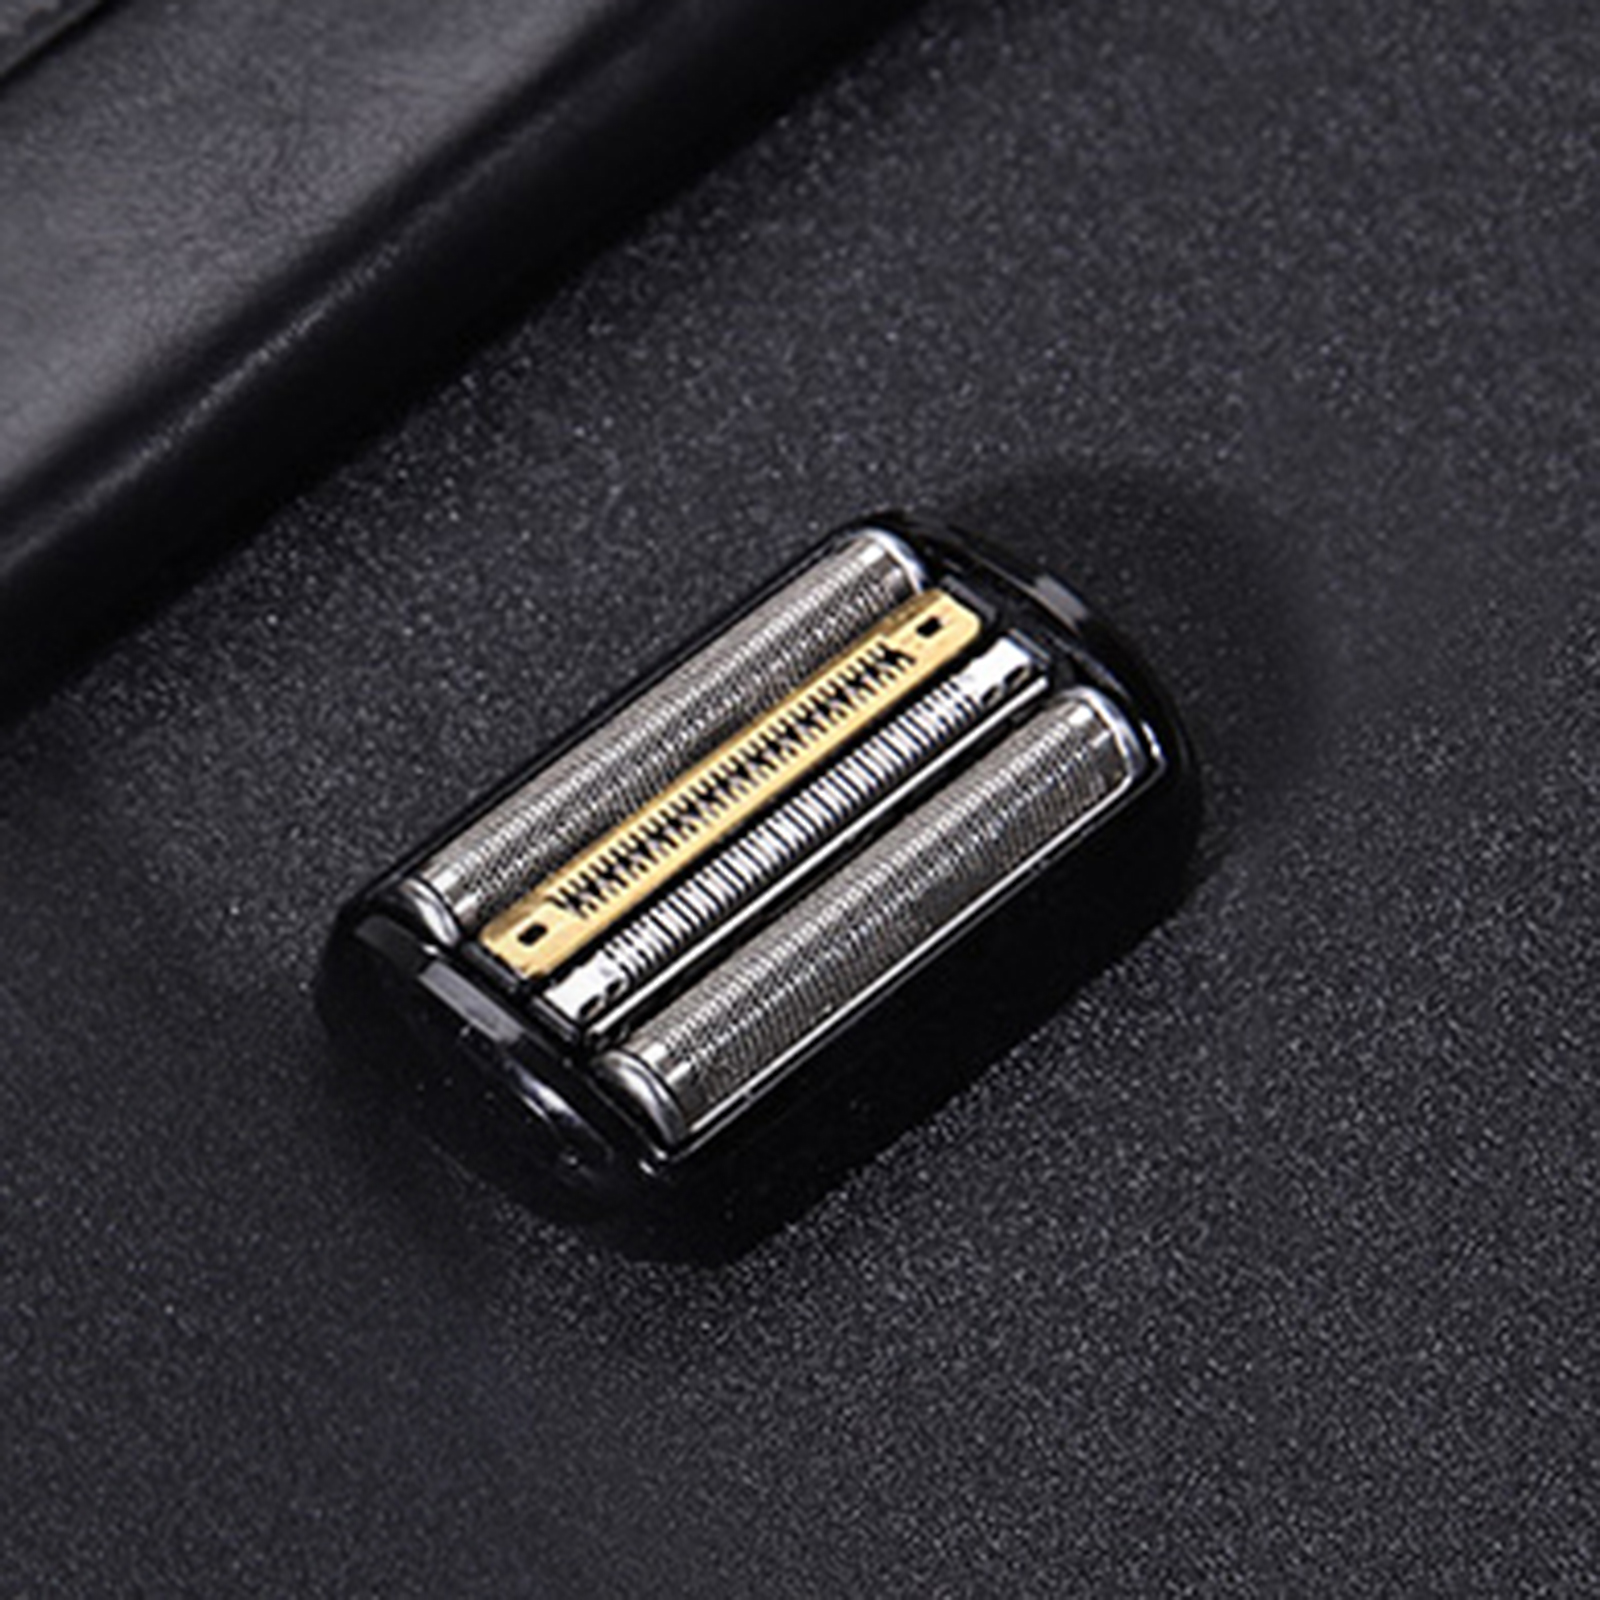 Foil & Cutter Head Cassette Cartridge 92B 92S for BRAUN Electric Razor Shaver Series 9 9030S 9040S 9050CC 9090CC Parts|Personal Care Appliance Parts| |  - title=